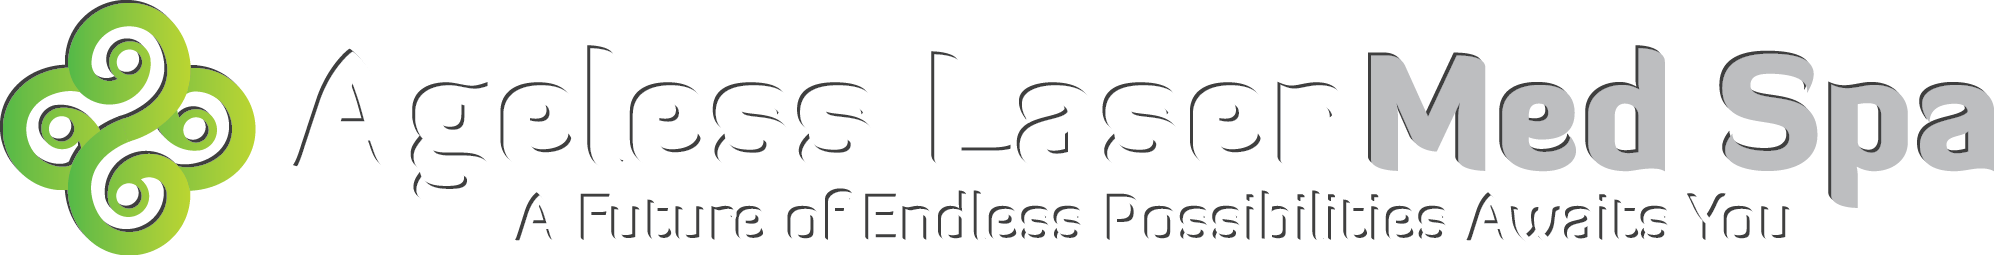 Ageless Laser Med Spa